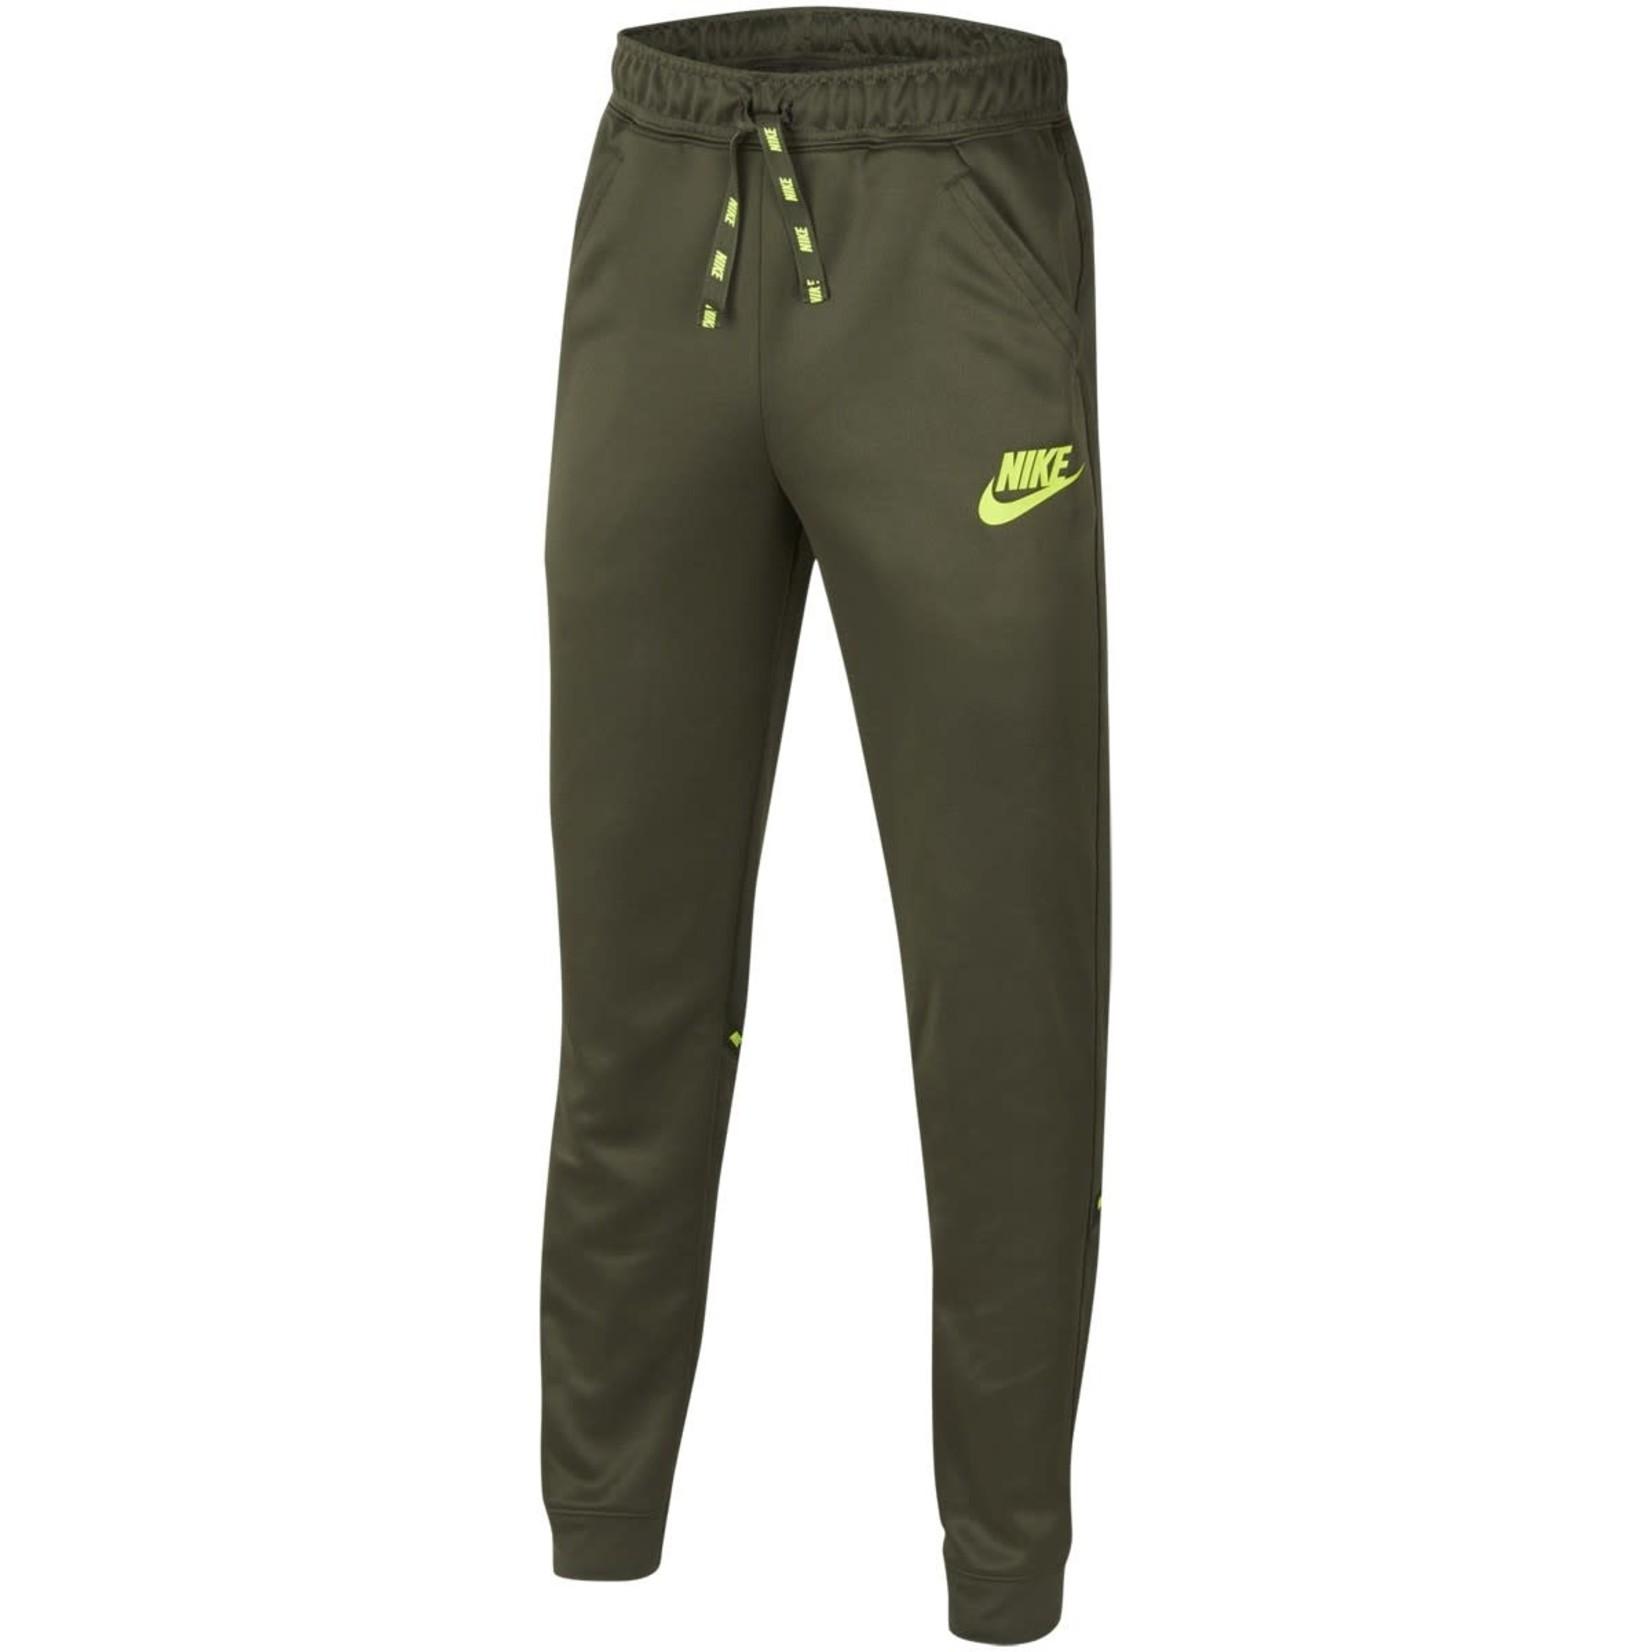 Nike Jongens Tapered Pants